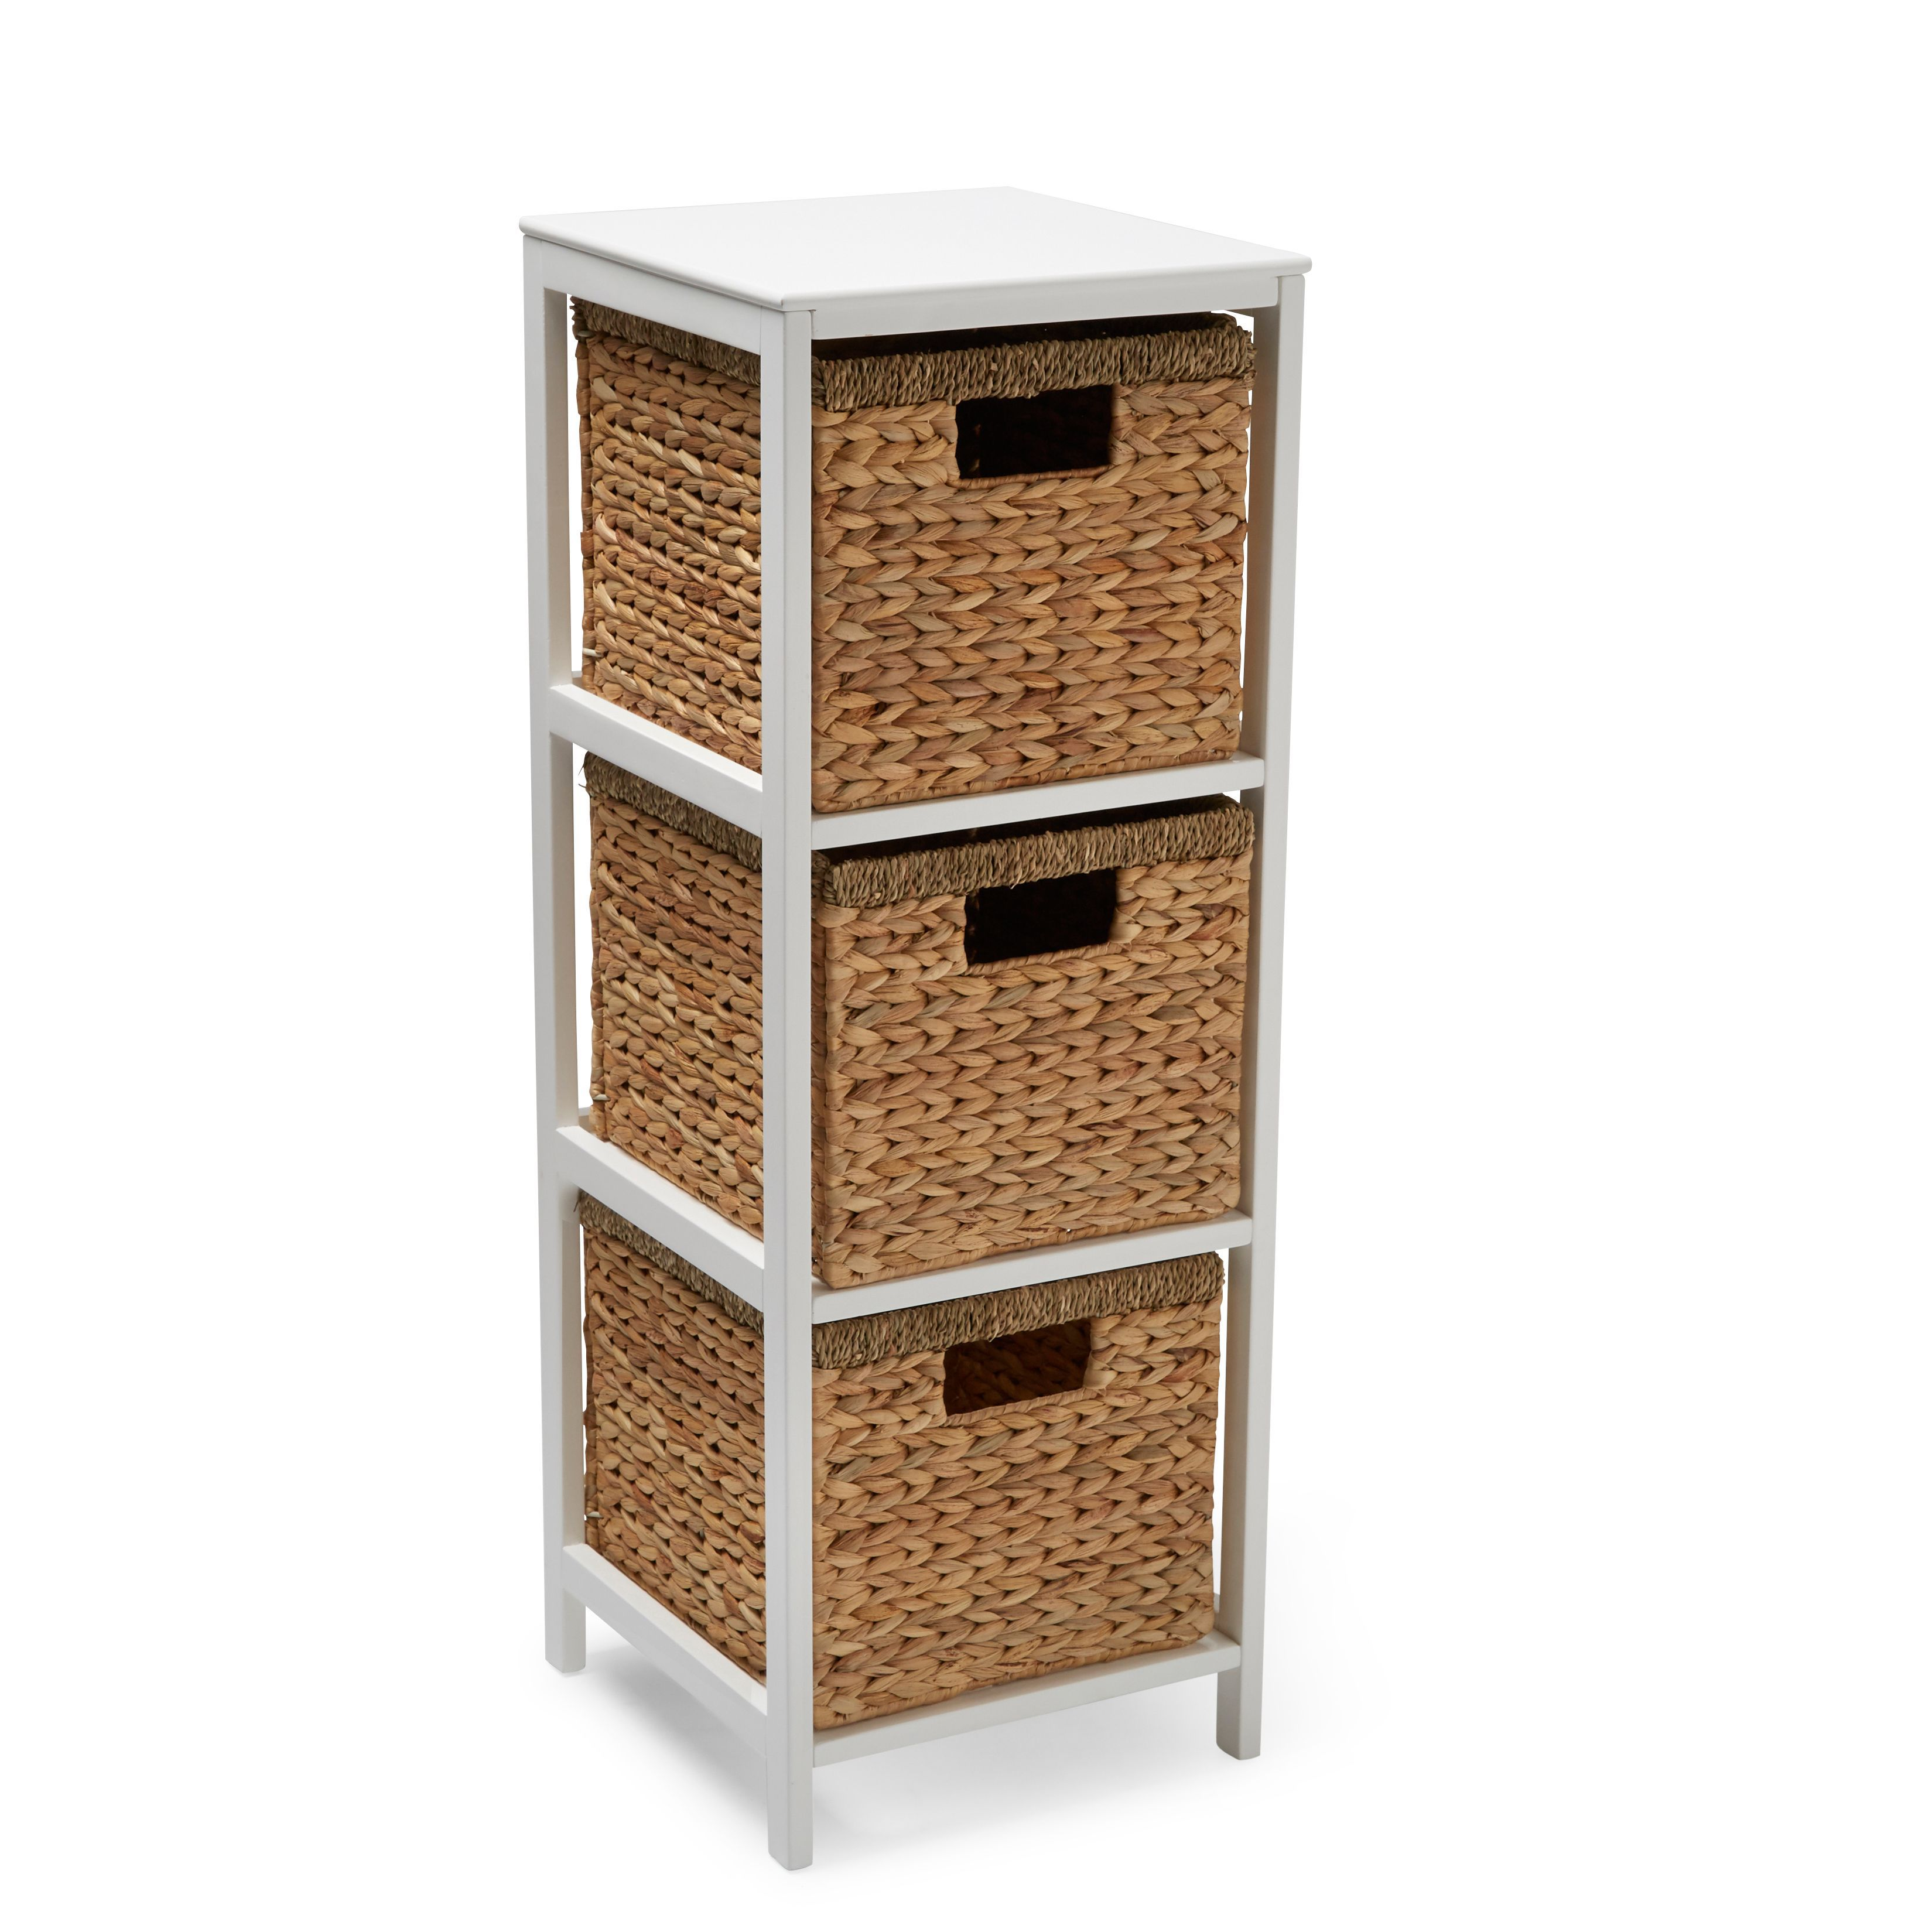 Cheap storage shelves cheap cabinet shelves 3 layers for Cheap book storage